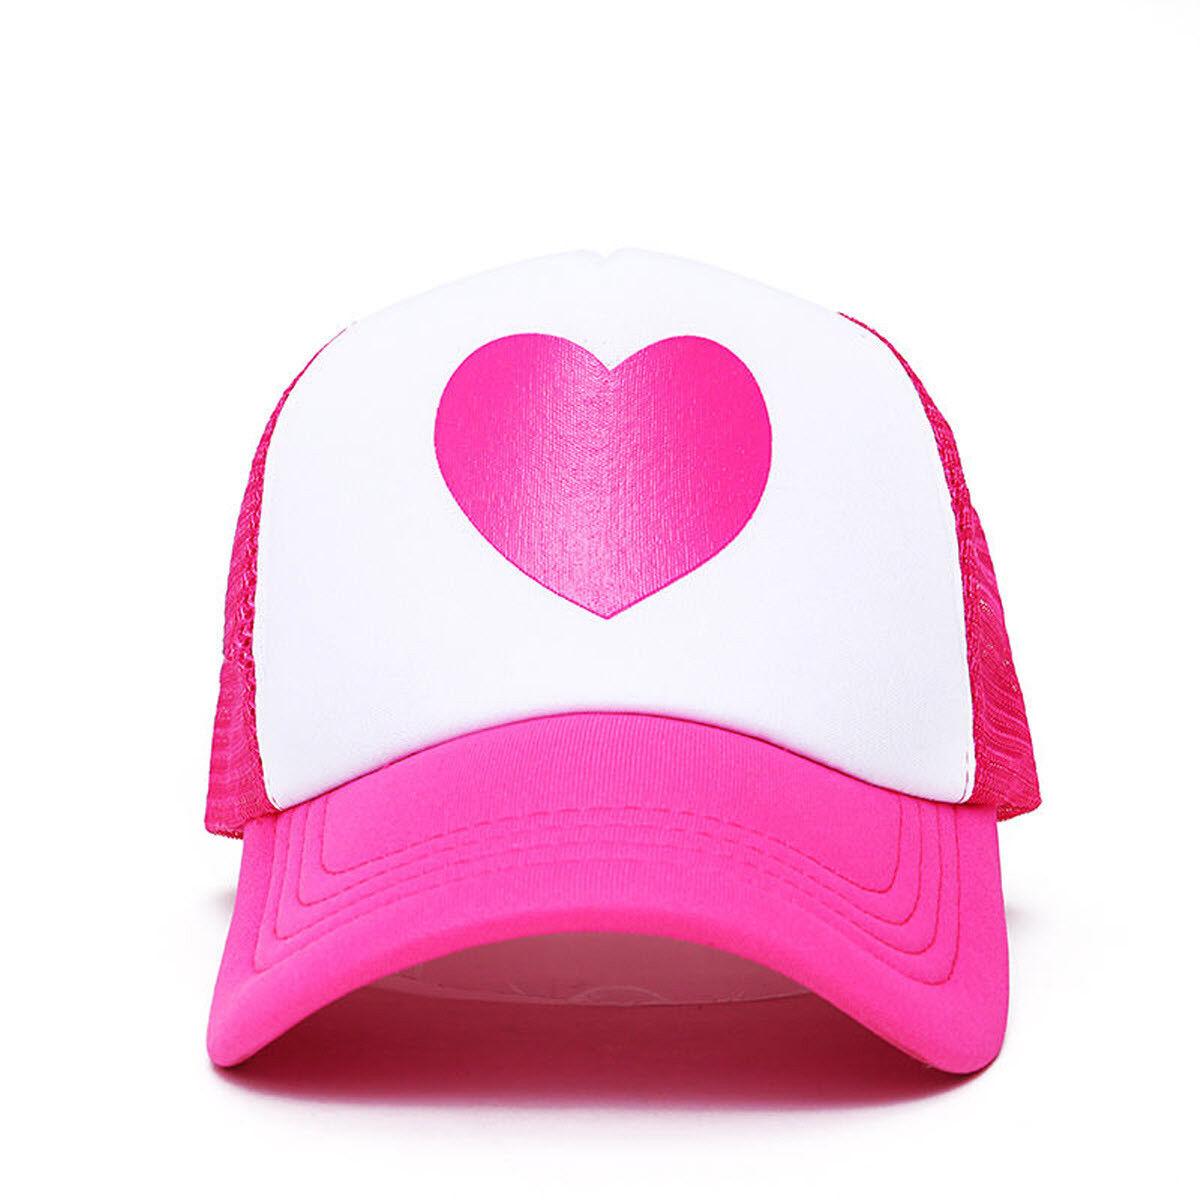 248c9a3af Mabel Pines Pink Heart Trucker Hat Gravity Falls TV Show Baseball Cap  Costume